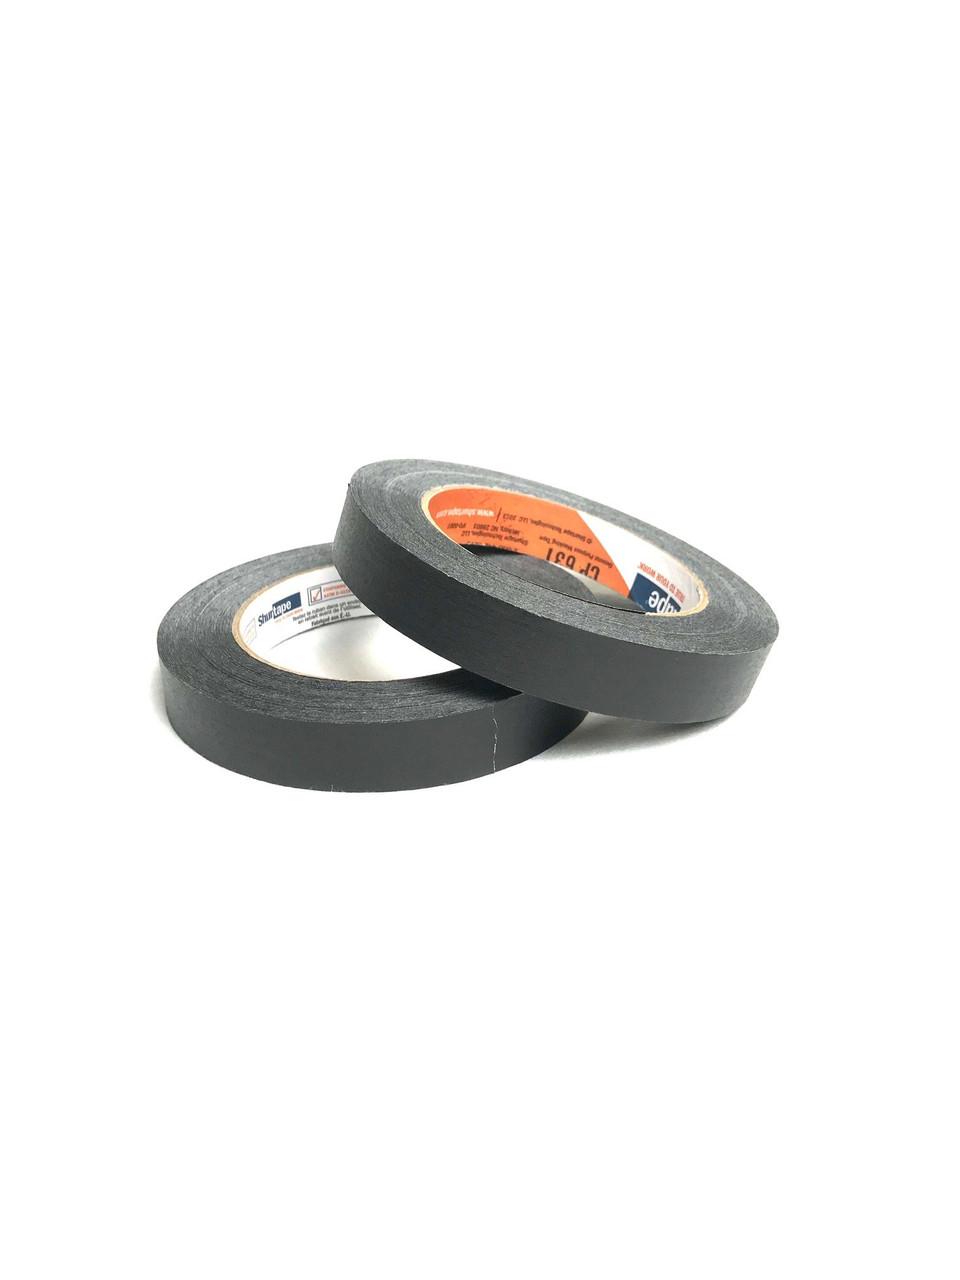 Cardboard Target Tape - Black